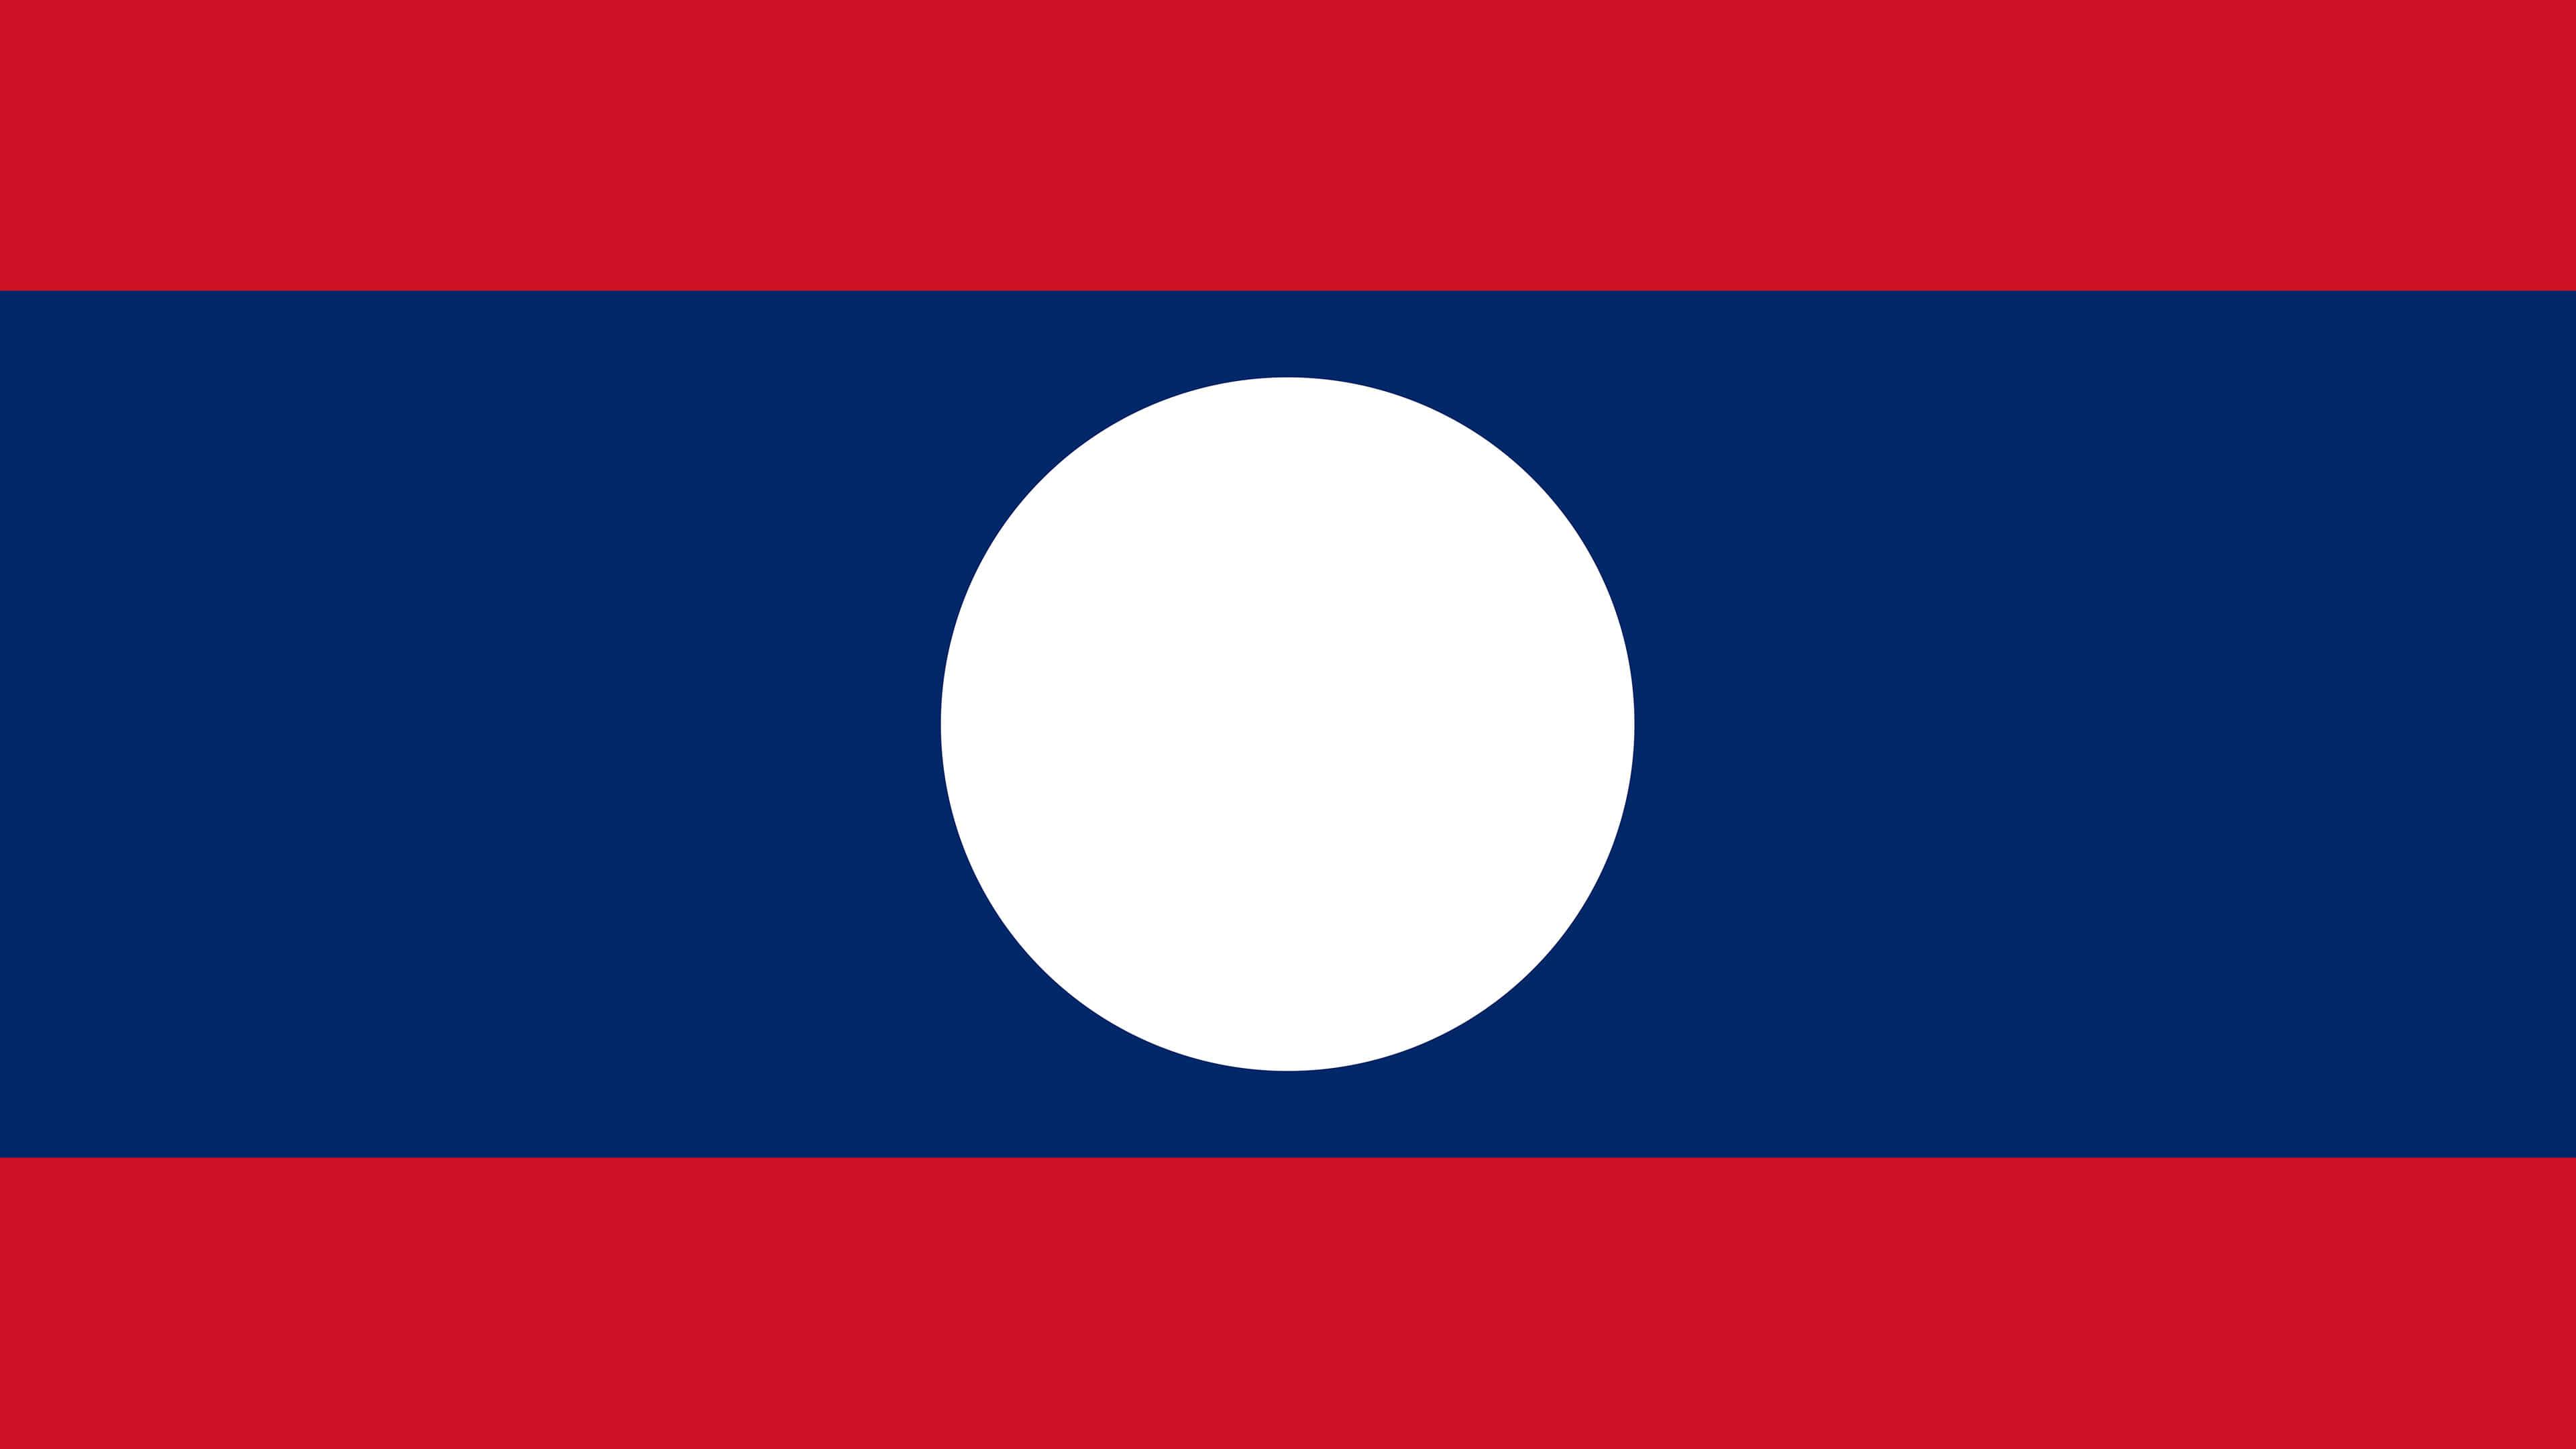 laos flag uhd 4k wallpaper